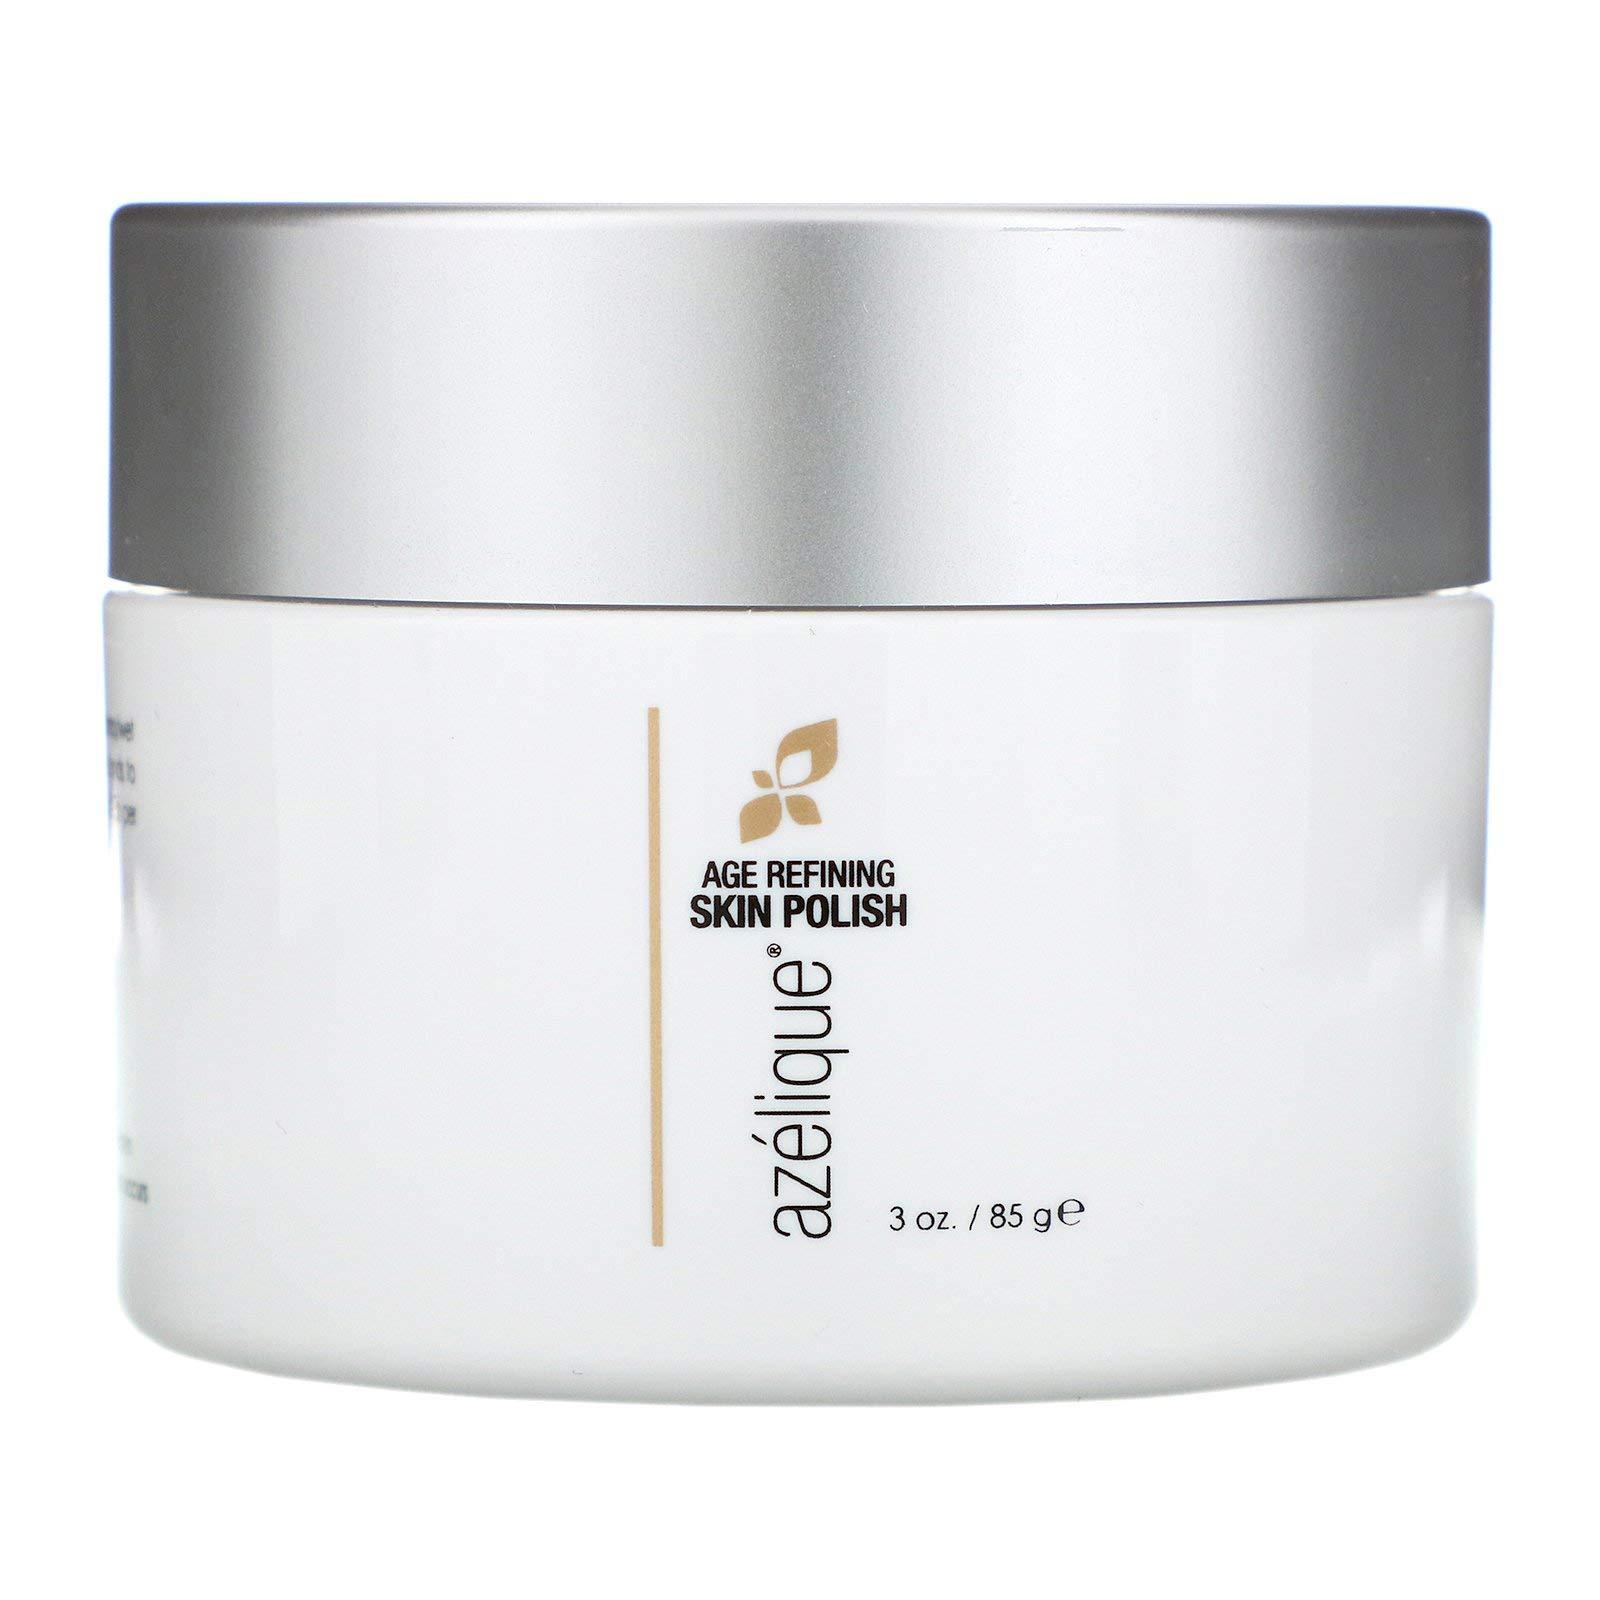 Azelique Age Refining Skin Polish, Cleansing and Exfoliating, No Parabens, No Sulfates, 3 oz (85 g)